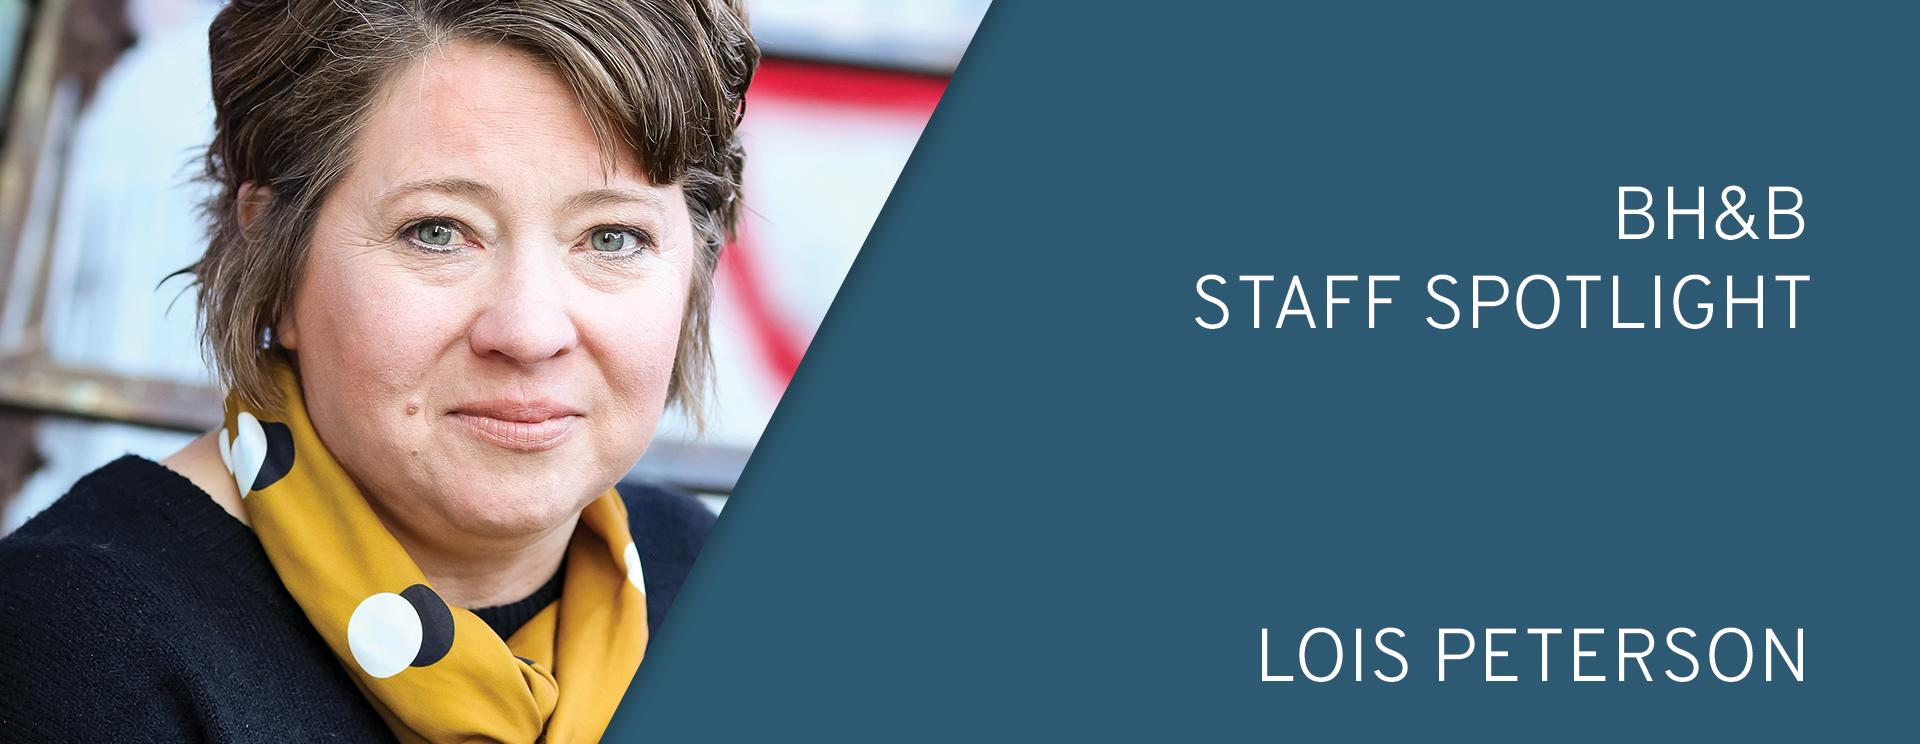 BH&B Staff Spotlight: Lois Peterson